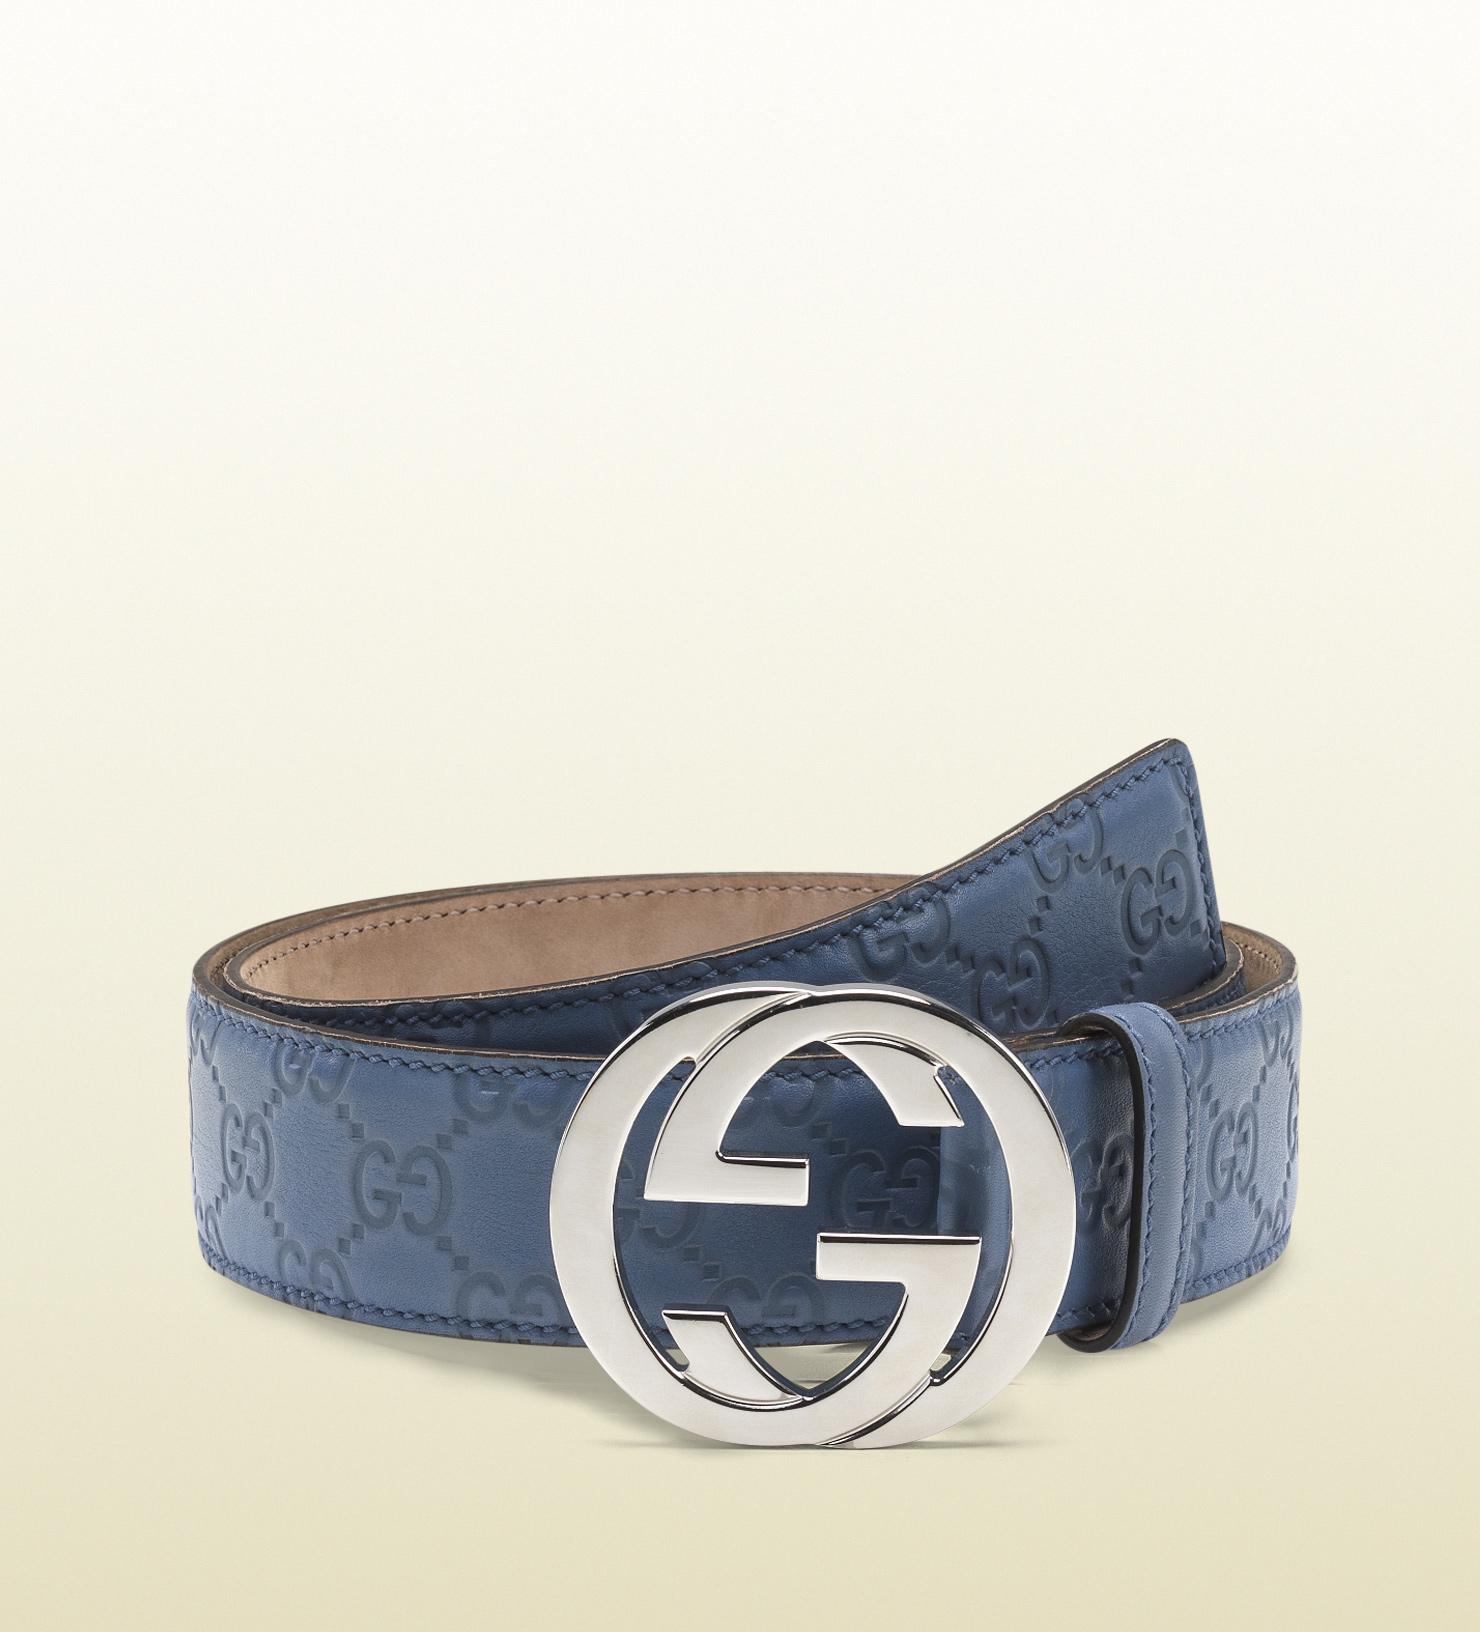 e8e34ac57b0 Lyst - Gucci Sky Blue Guccissima Leather Belt with Interlocking G ...